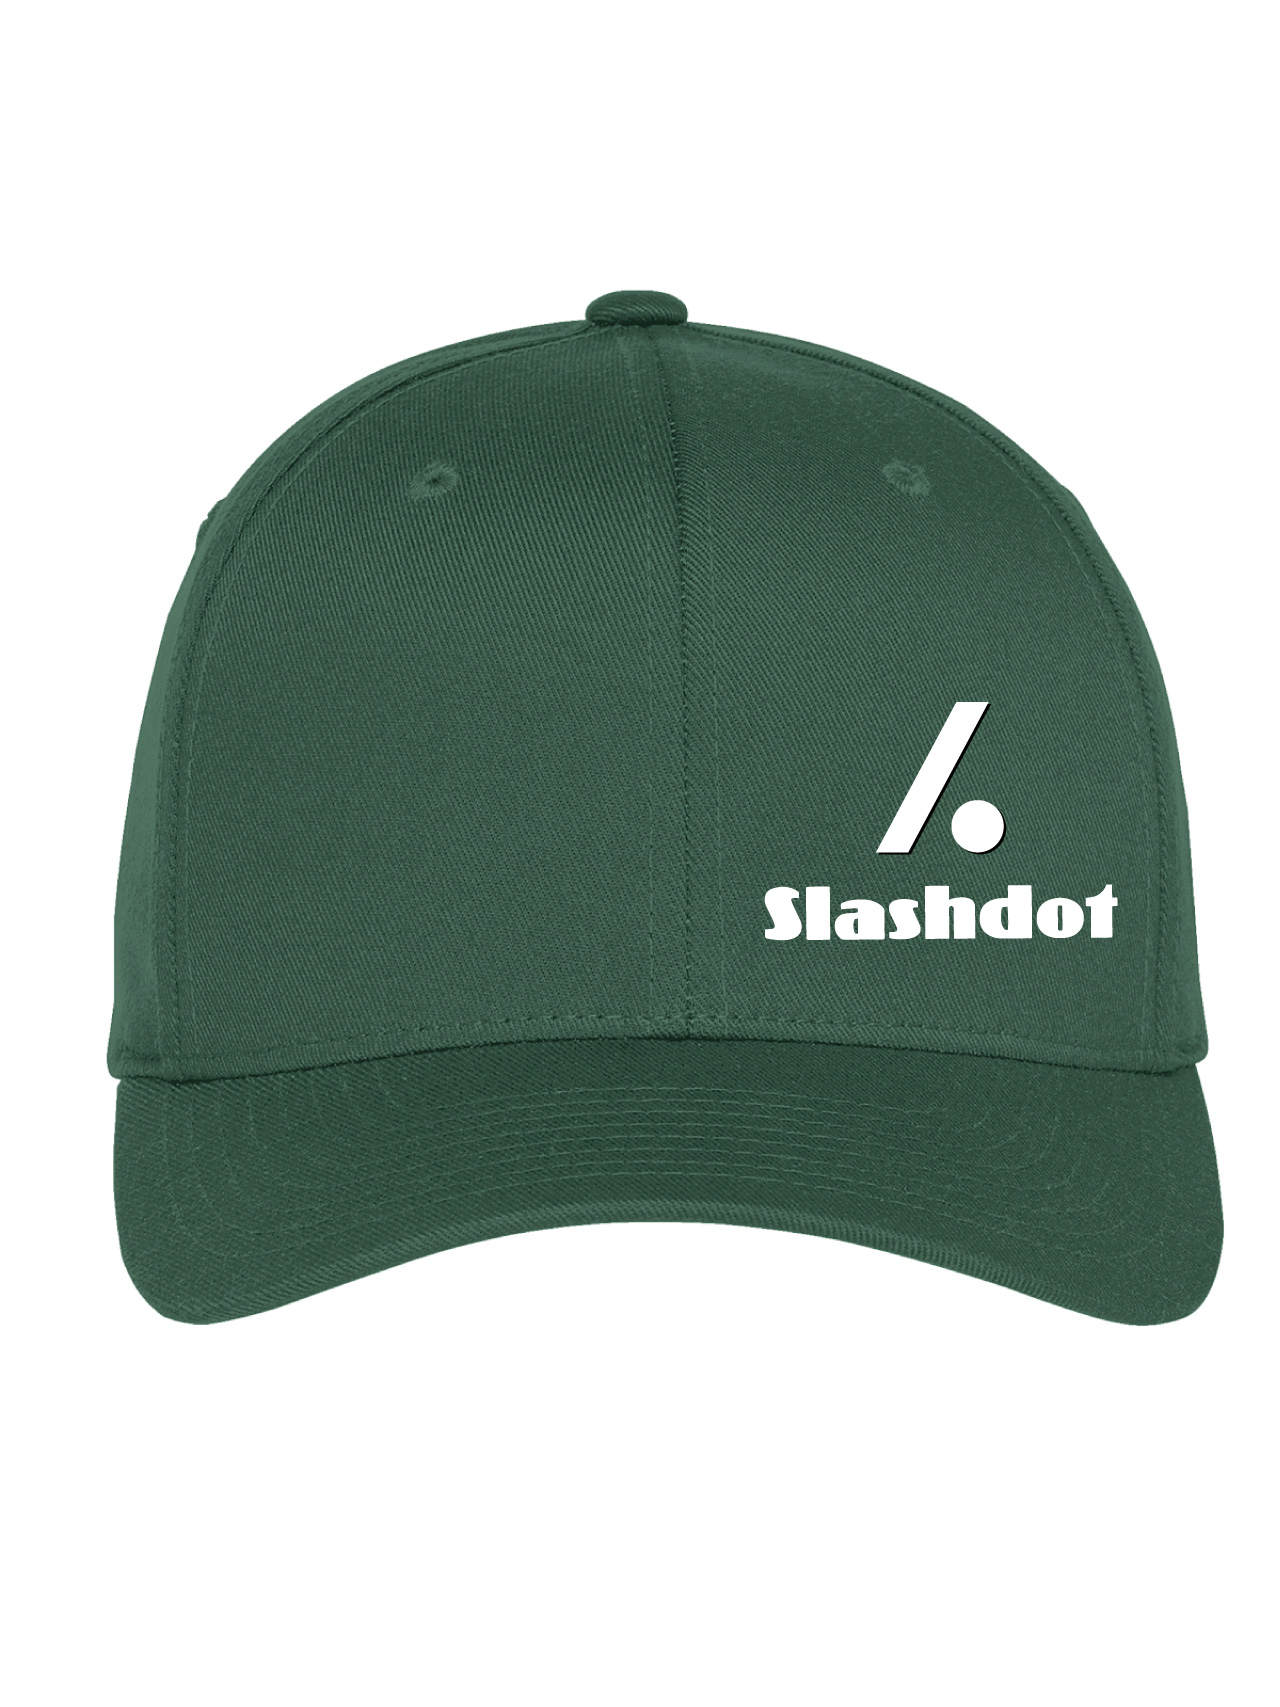 Slashdot Green Flexfit Cap